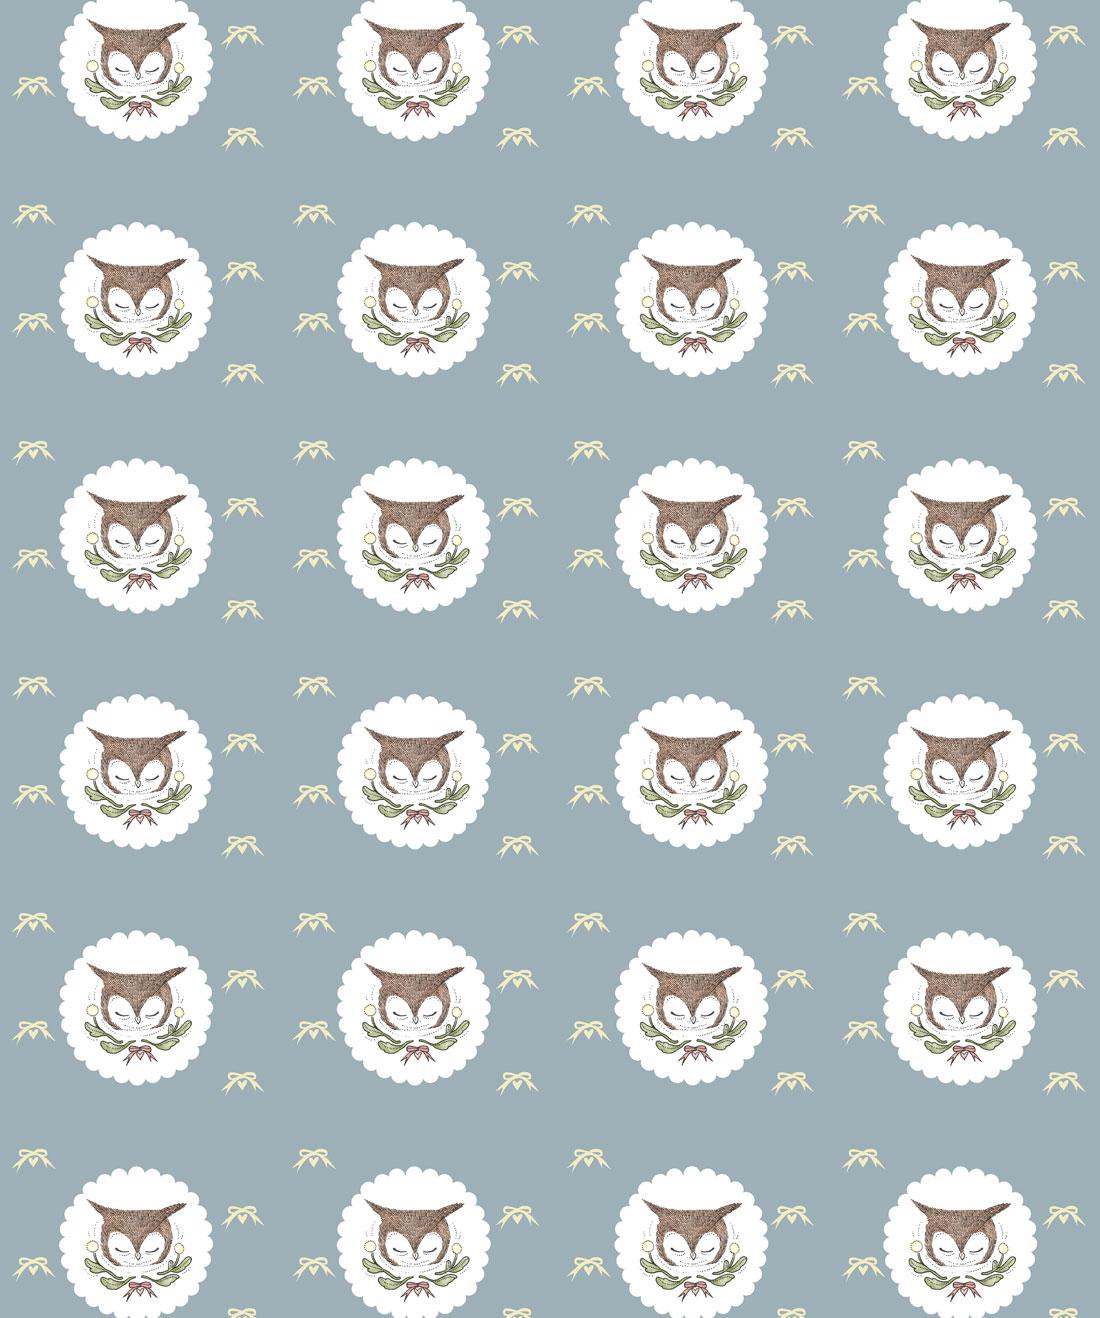 Owl Ribbons Wallpaper